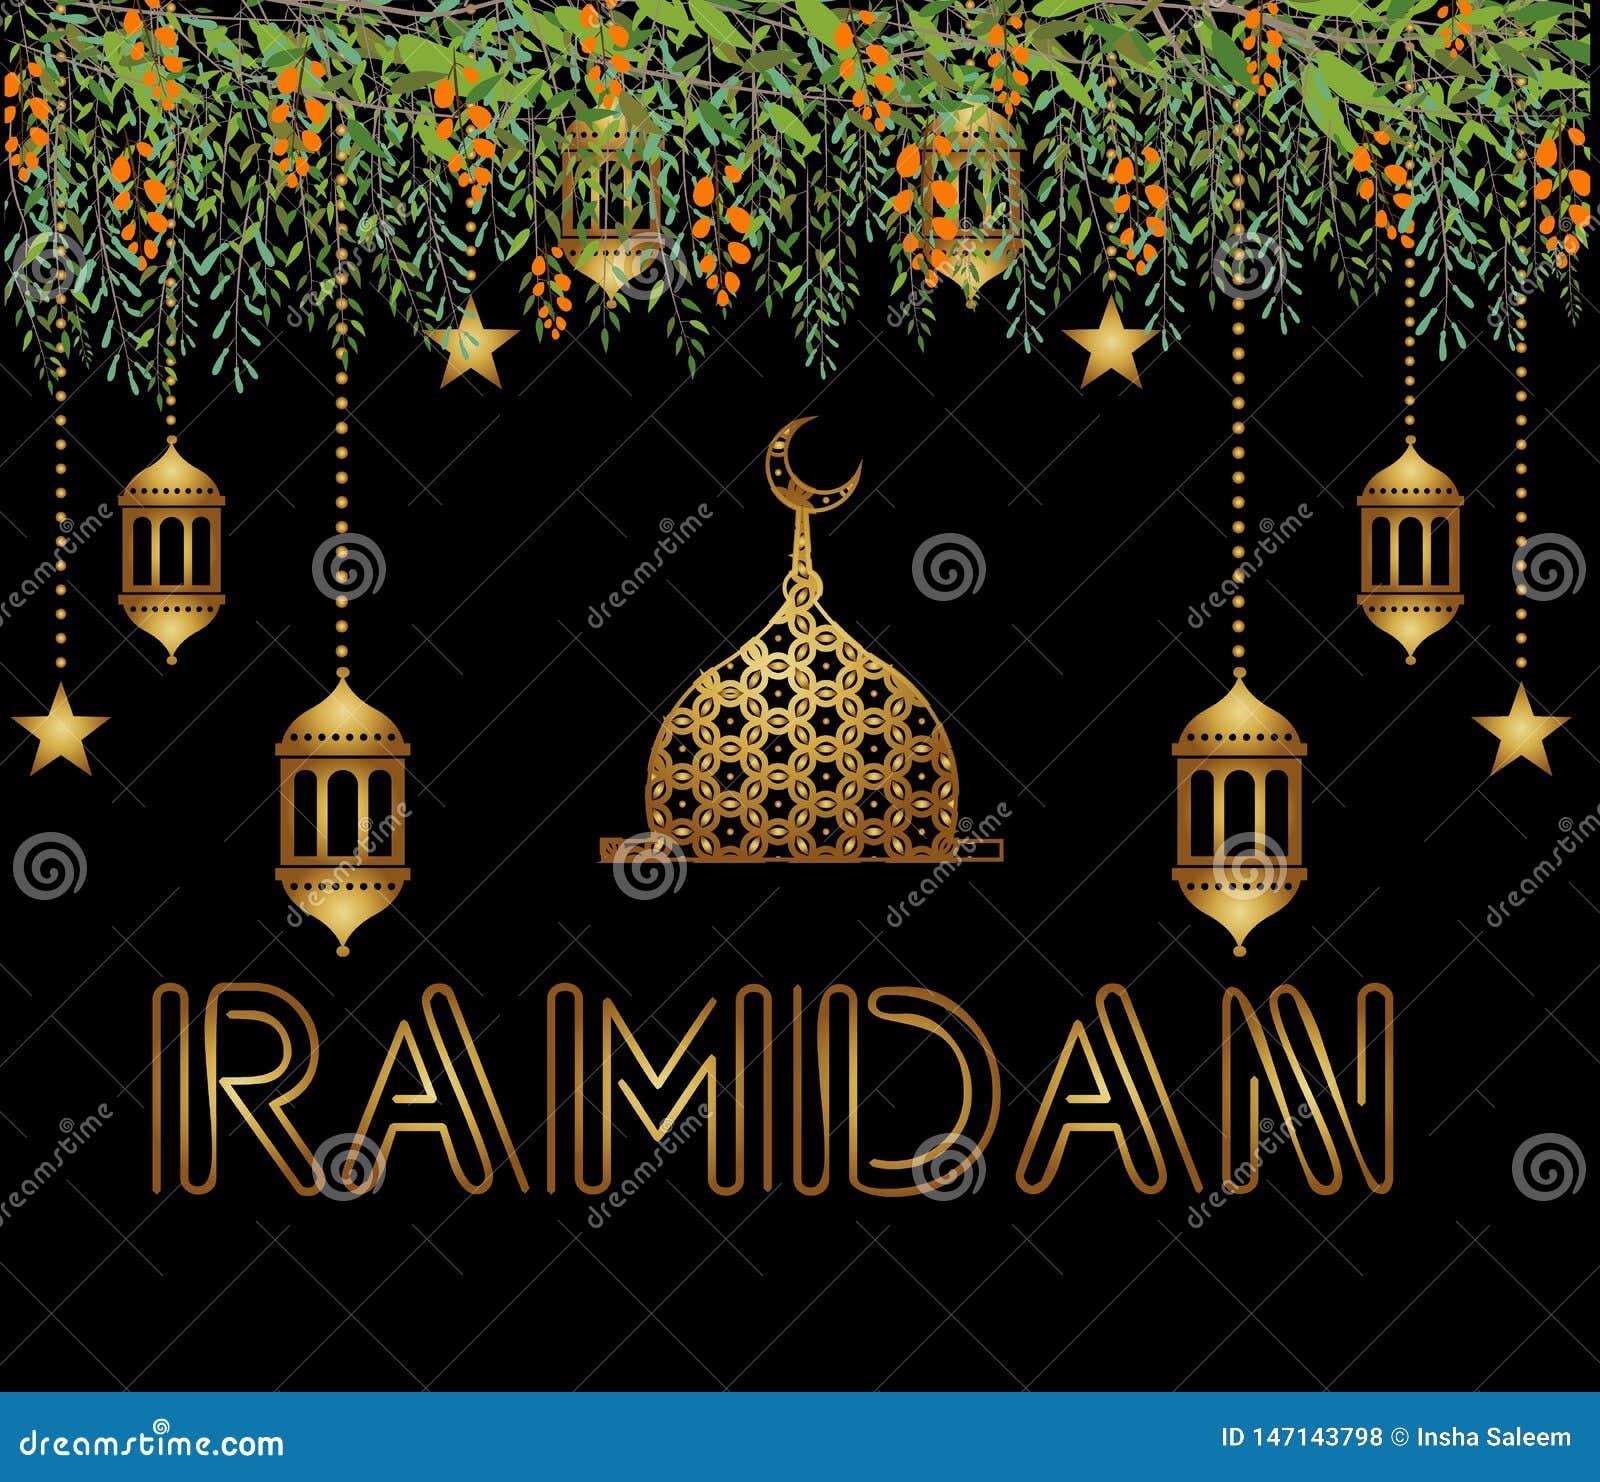 Ramadan Kareem Vector Background Illustration hermoso